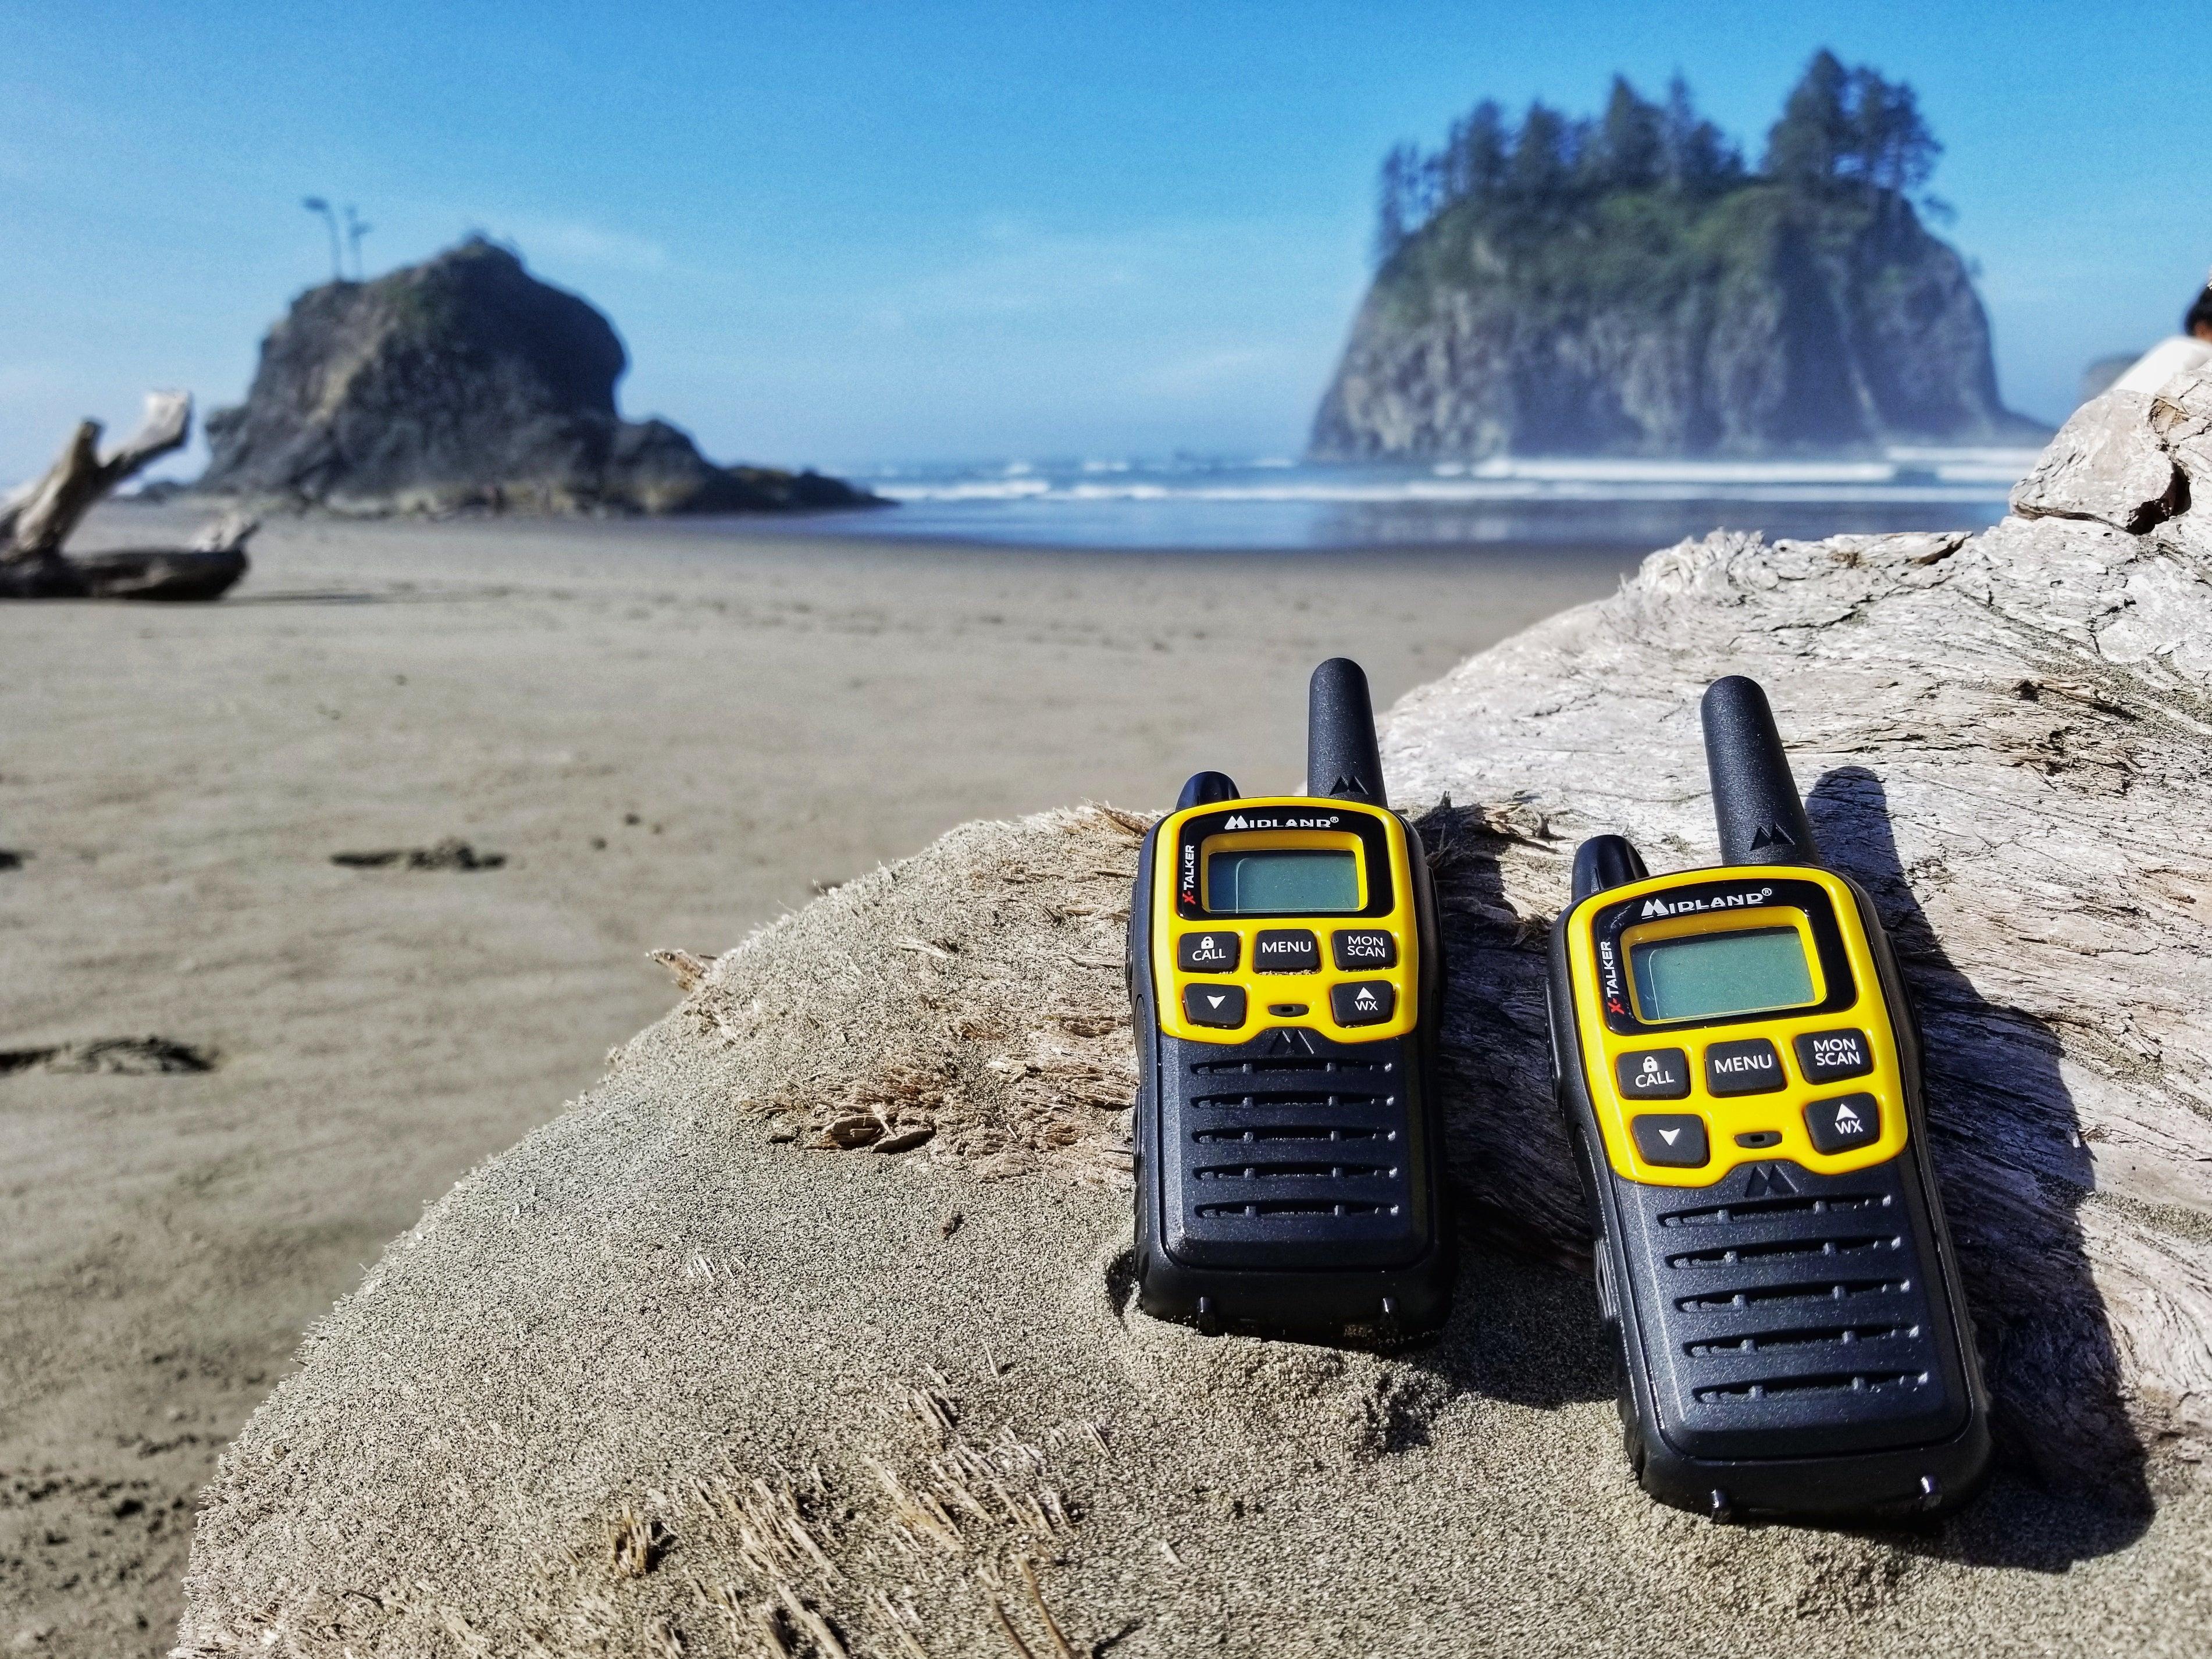 midland walkie talkie for kayak camping